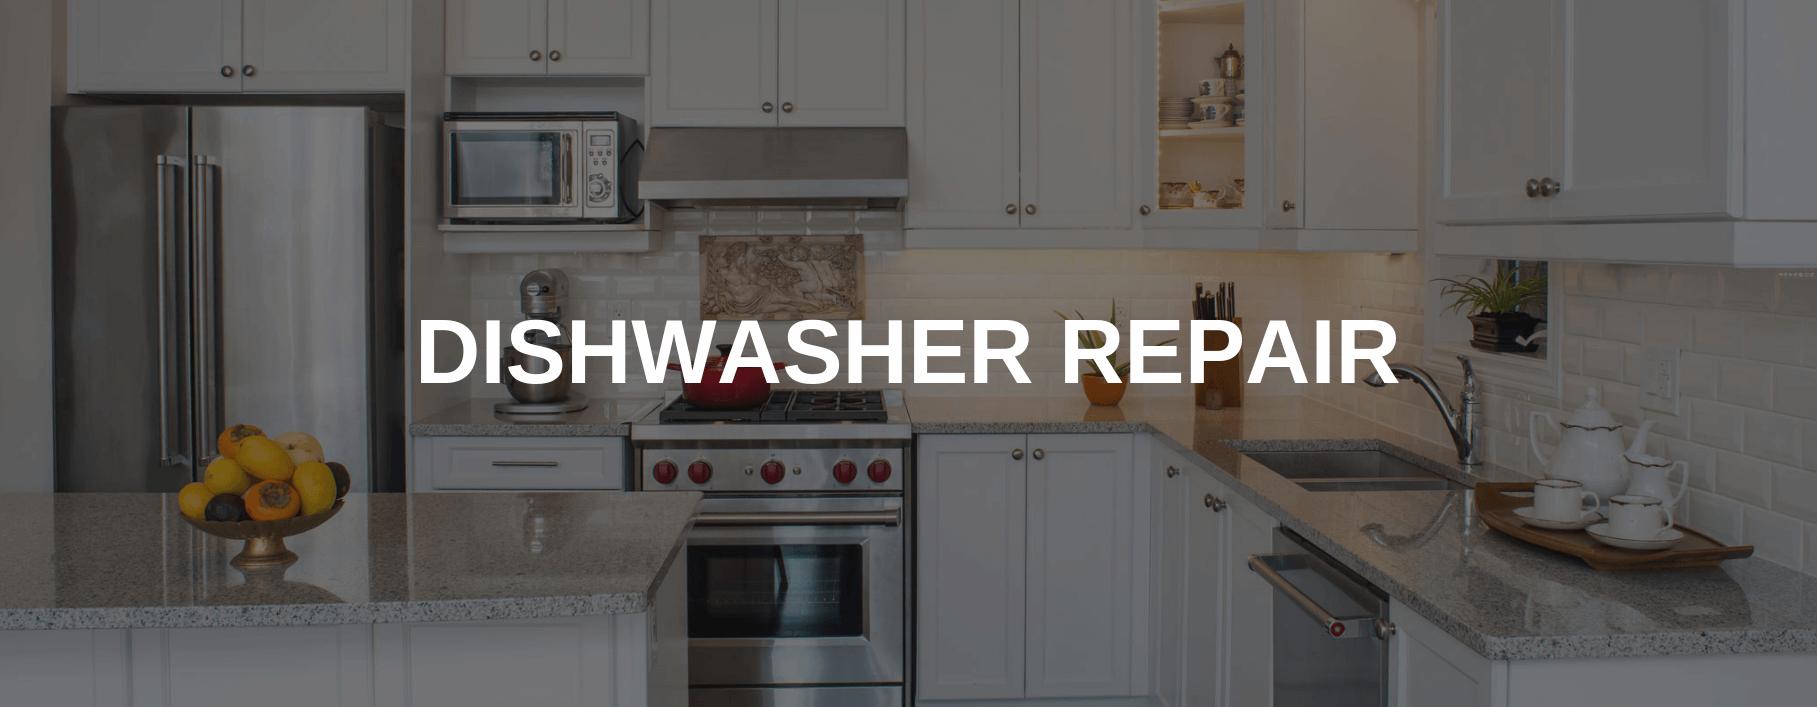 dishwasher repair st. petersburg